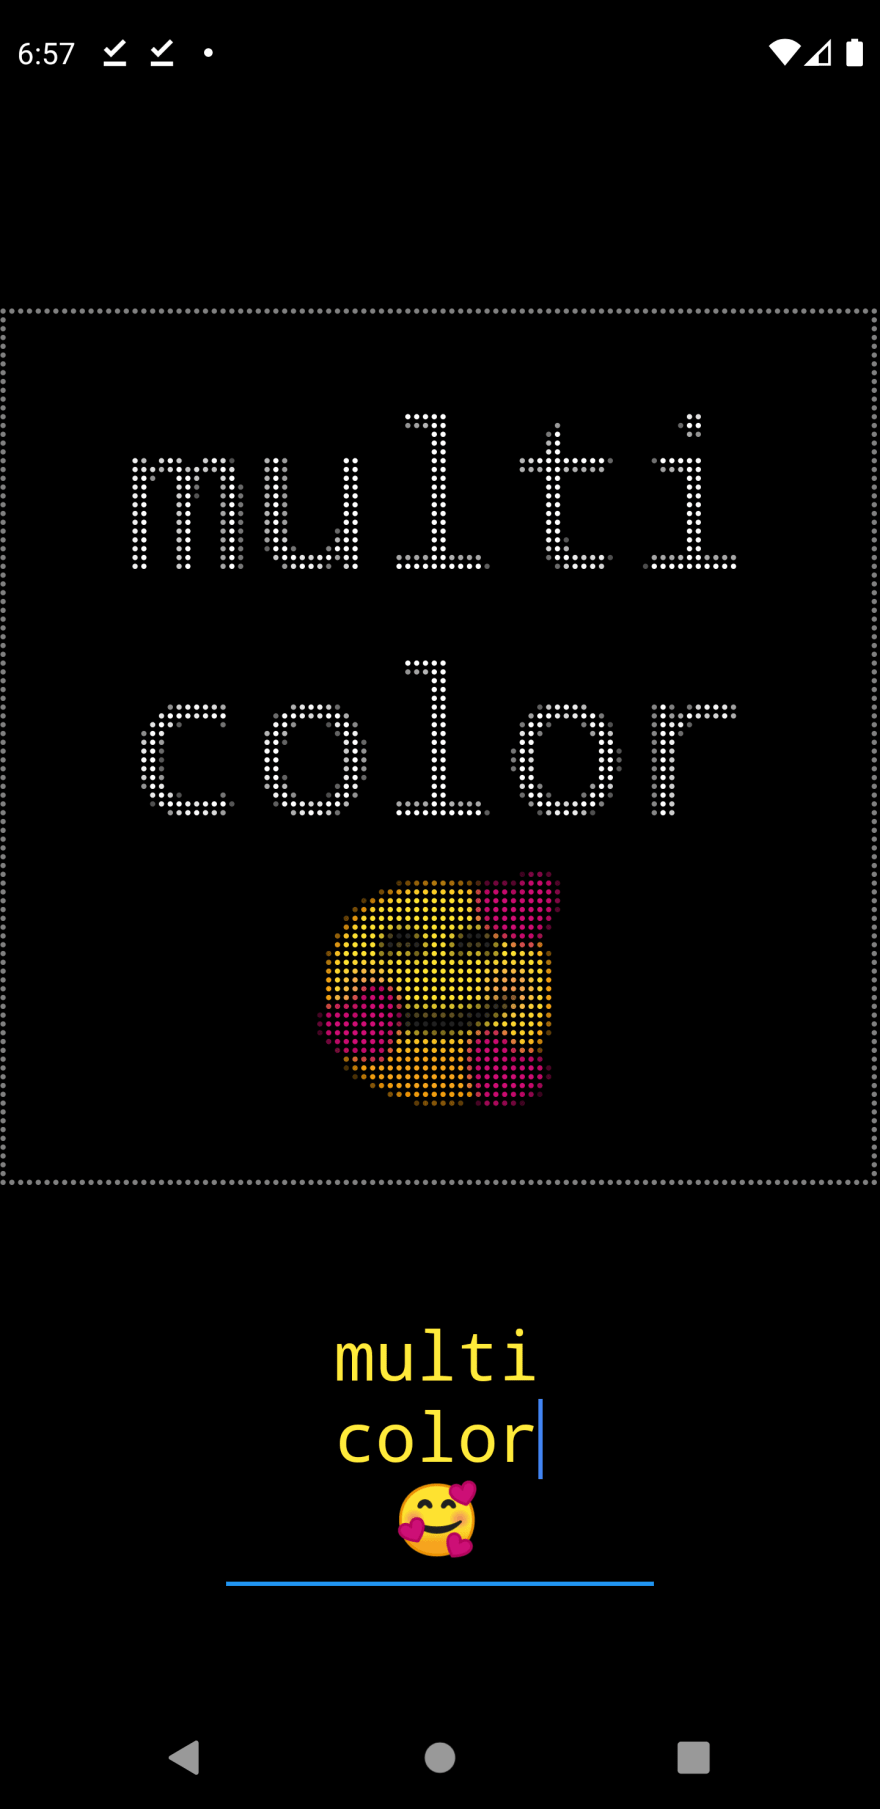 Flutter LED display iteration 6